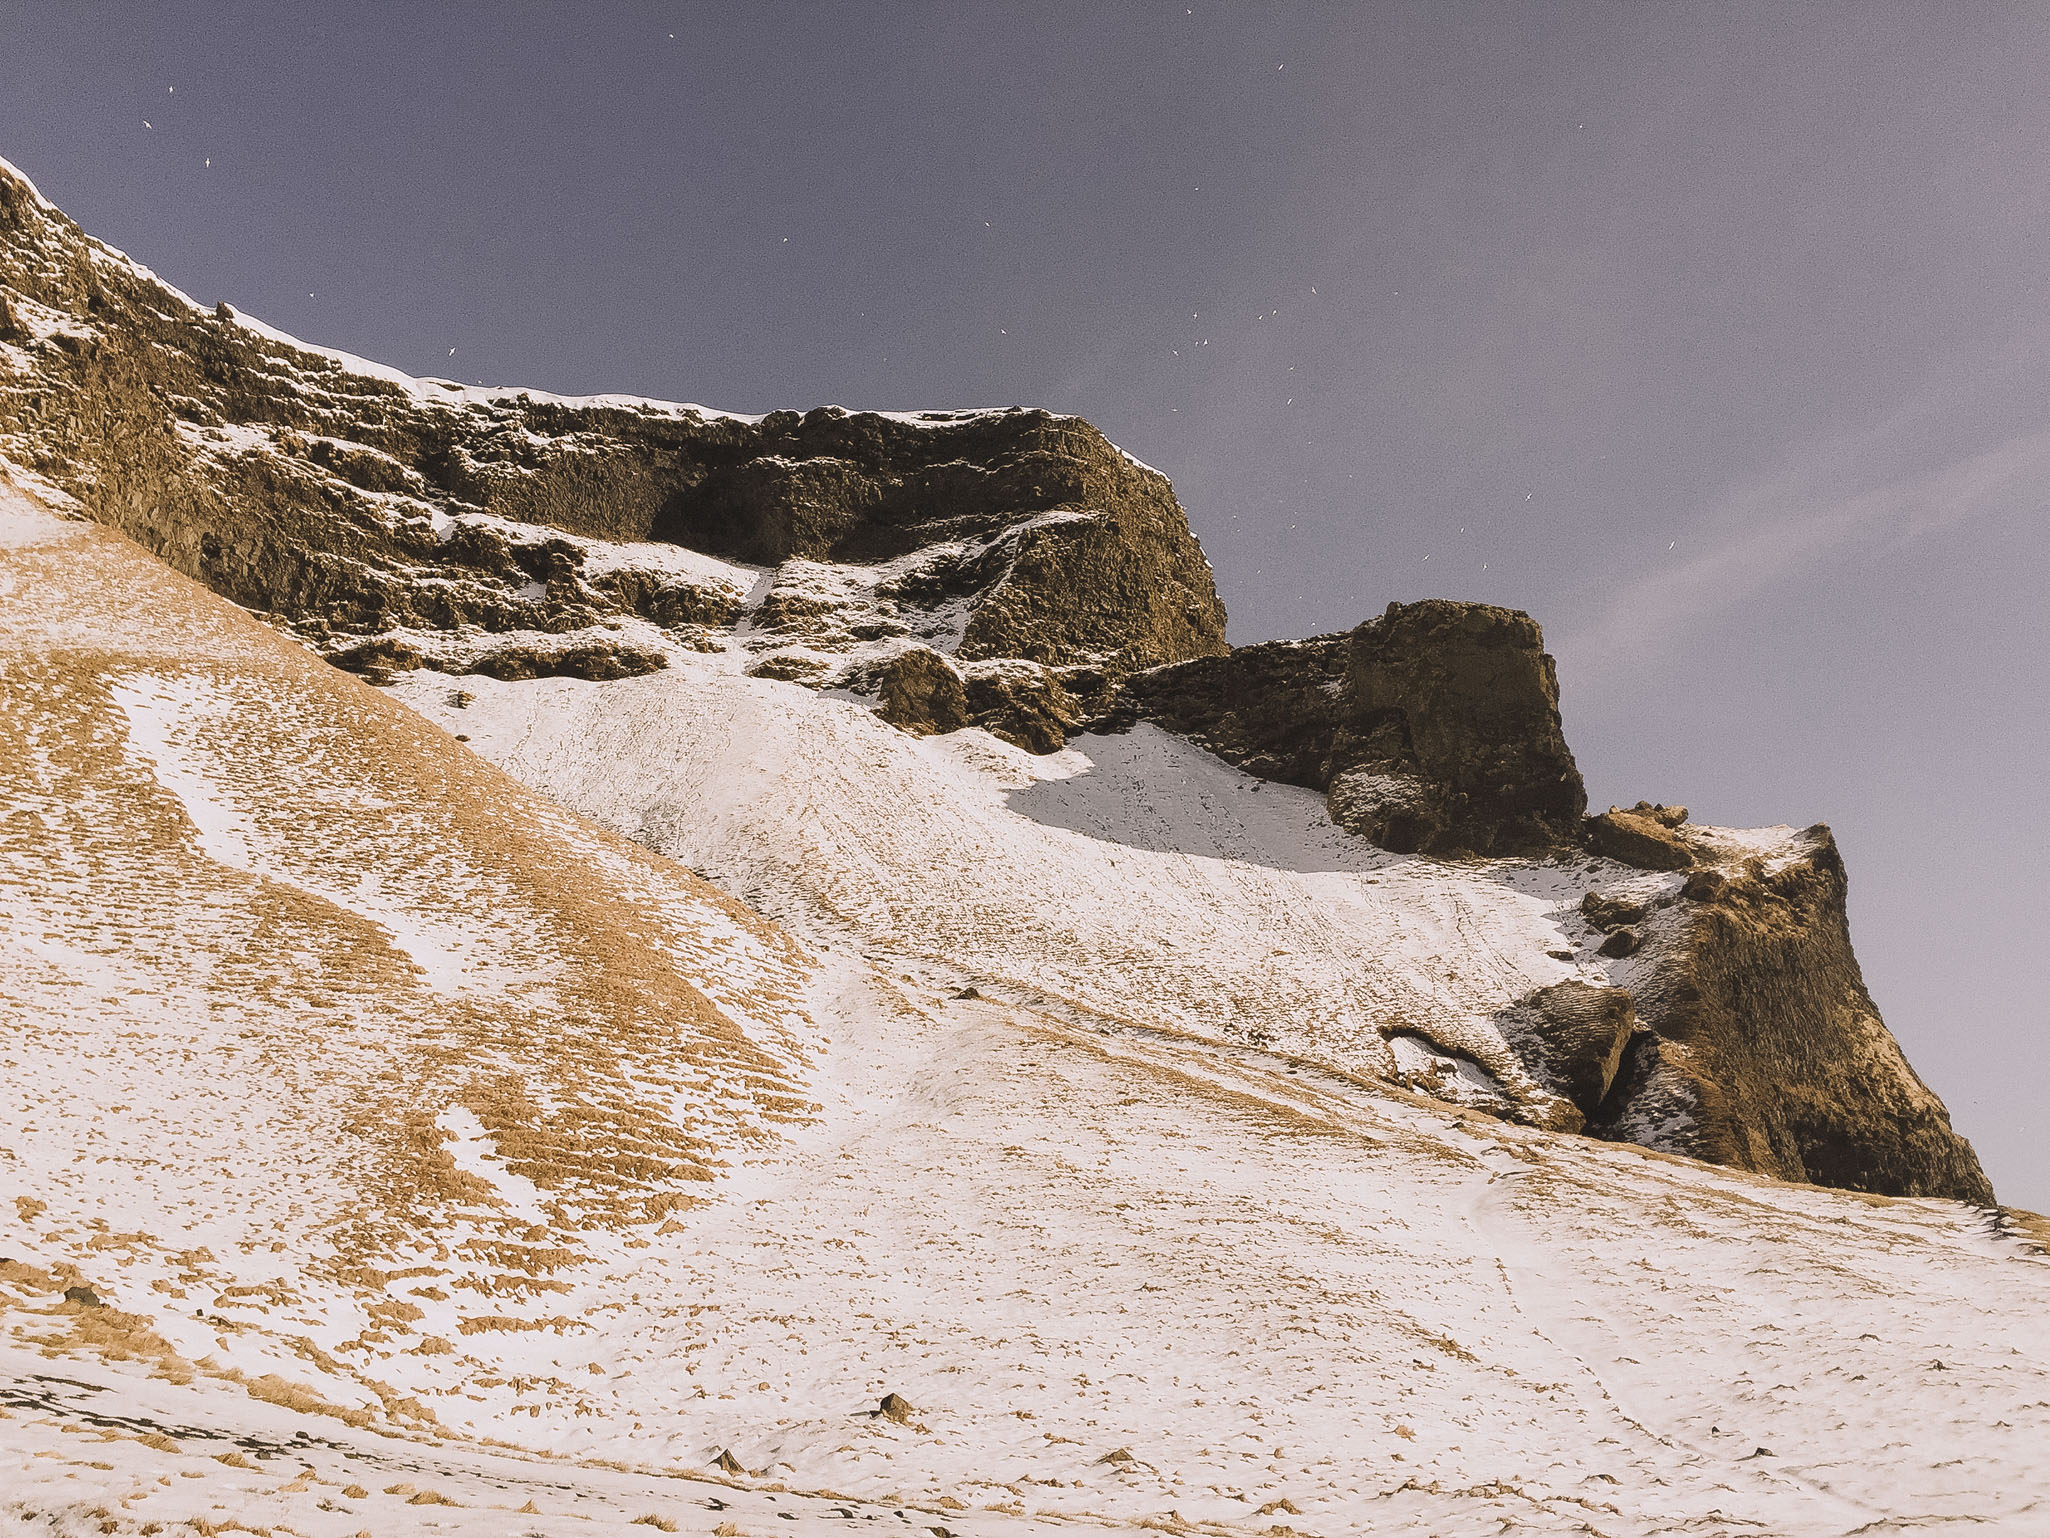 Road-trip-Islande-Iceland-Voyage-Travel-Portrait-Jérémy-Boyer-Sunny-day-Vik-black-sand-beach-sable-noir-Reynifjara-1.jpg